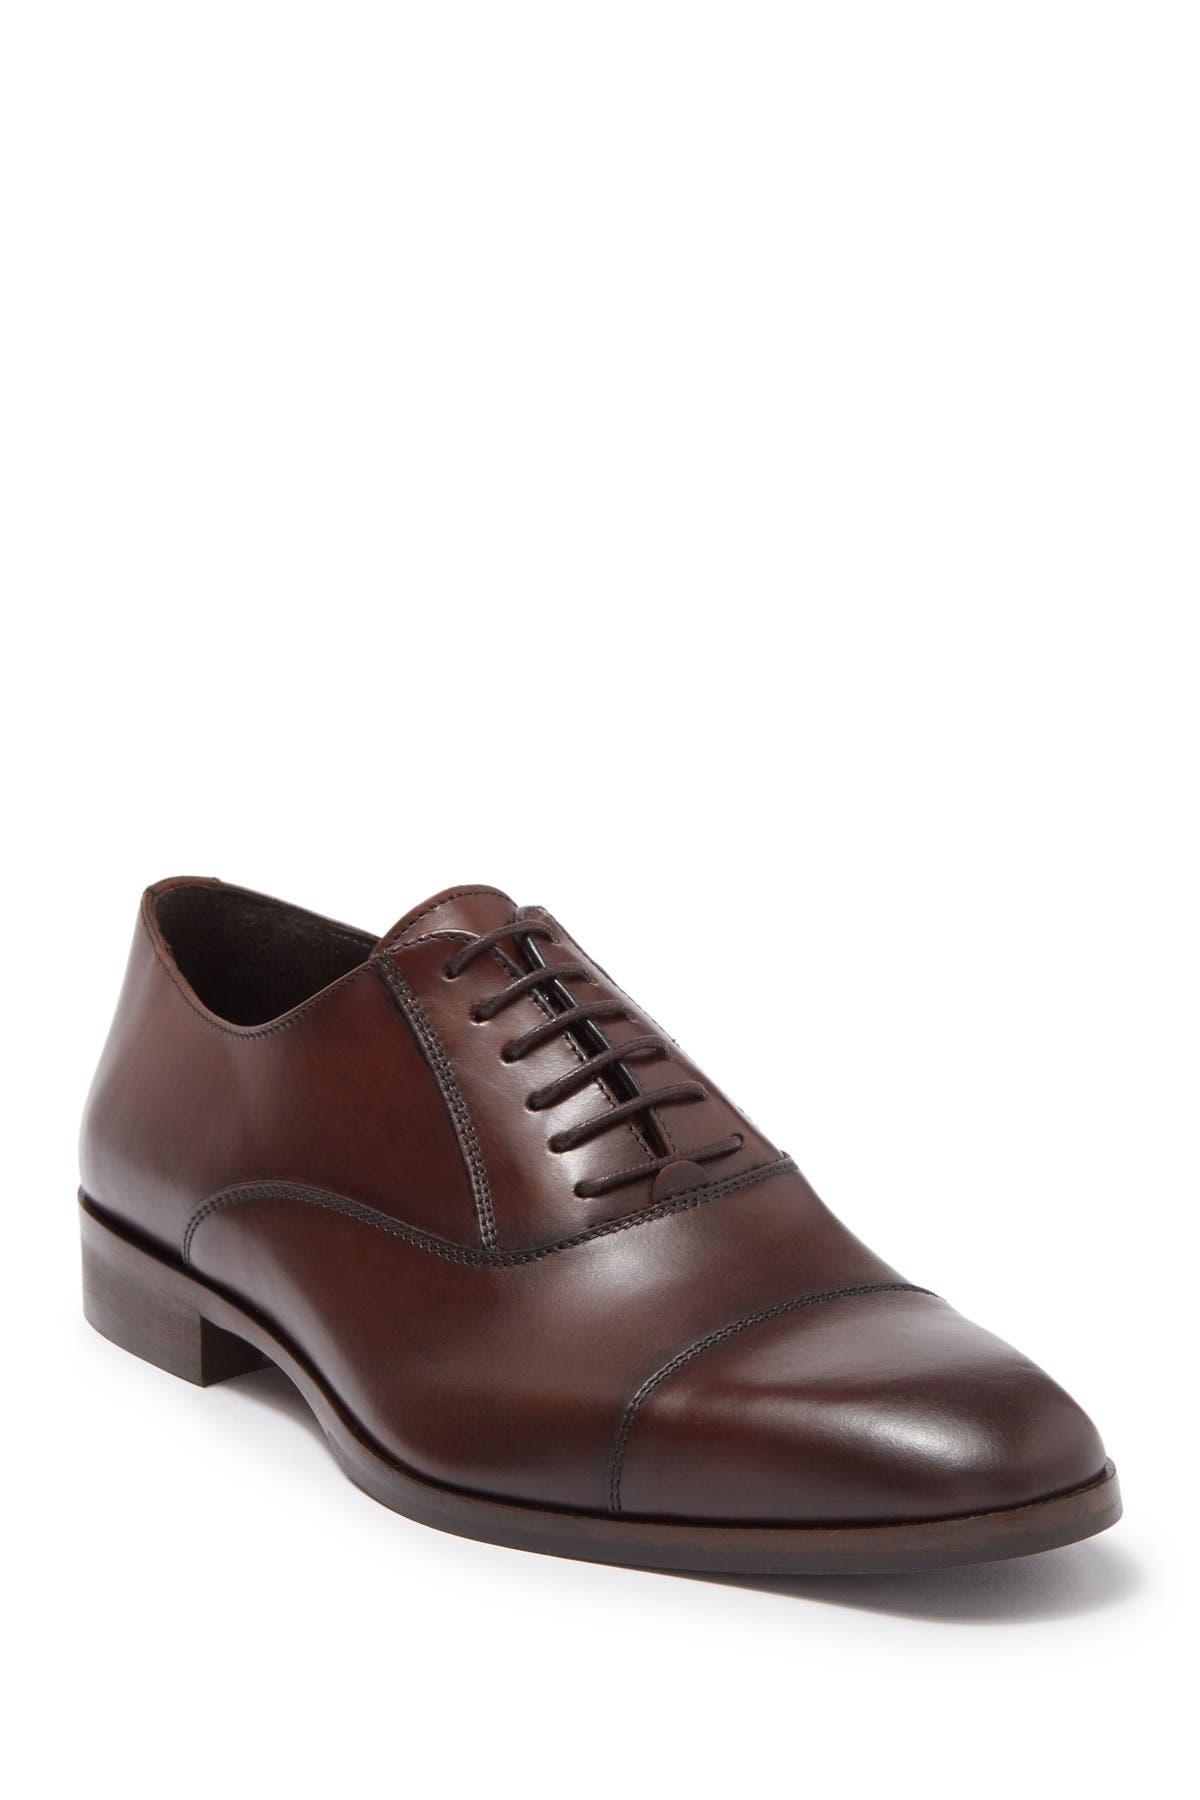 Color : Black, Size : 6.5 D MXL Mens Business Casual Oxfords Pointed Toe Block Heel Lace Up Leisure Shoes Dress Shoes M US